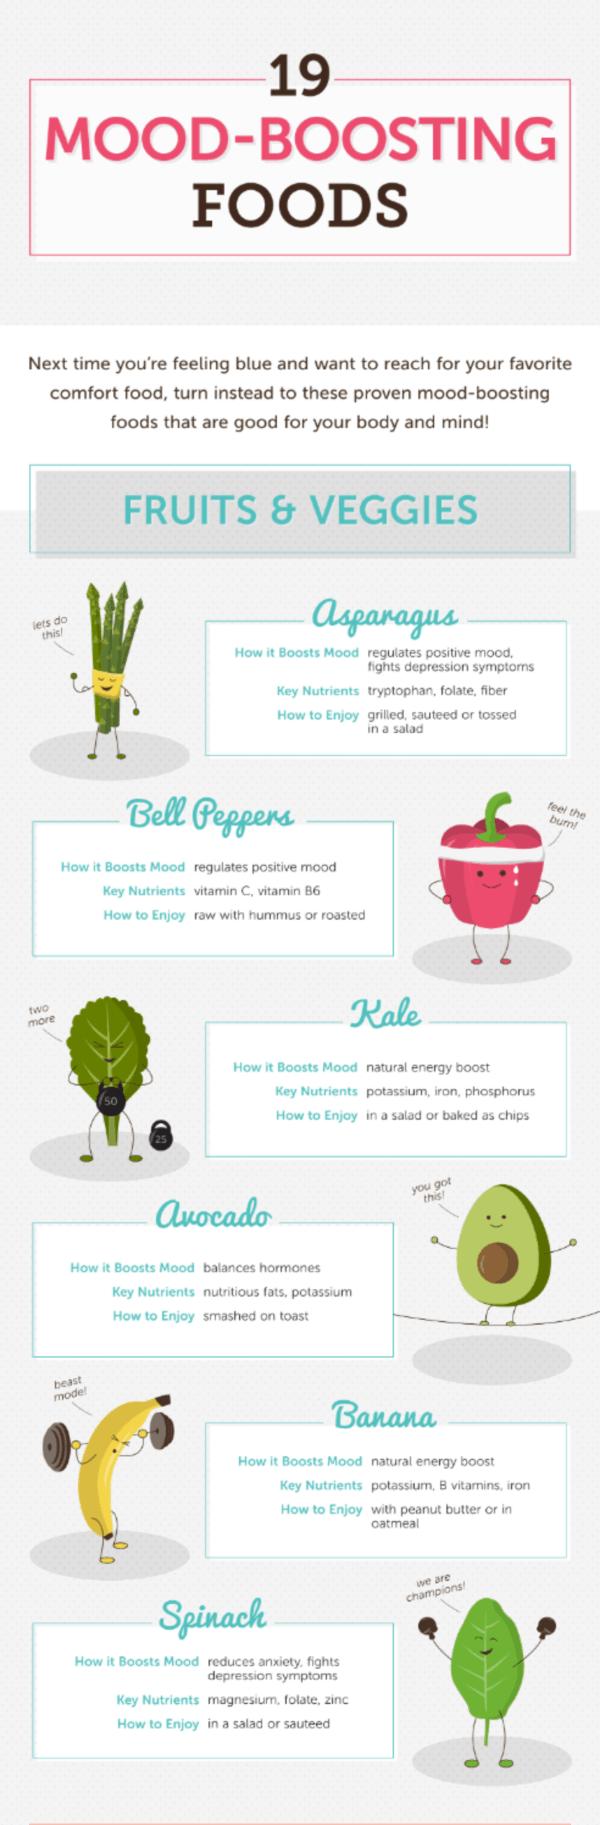 Mood Boosting Food: Fruits Veggies